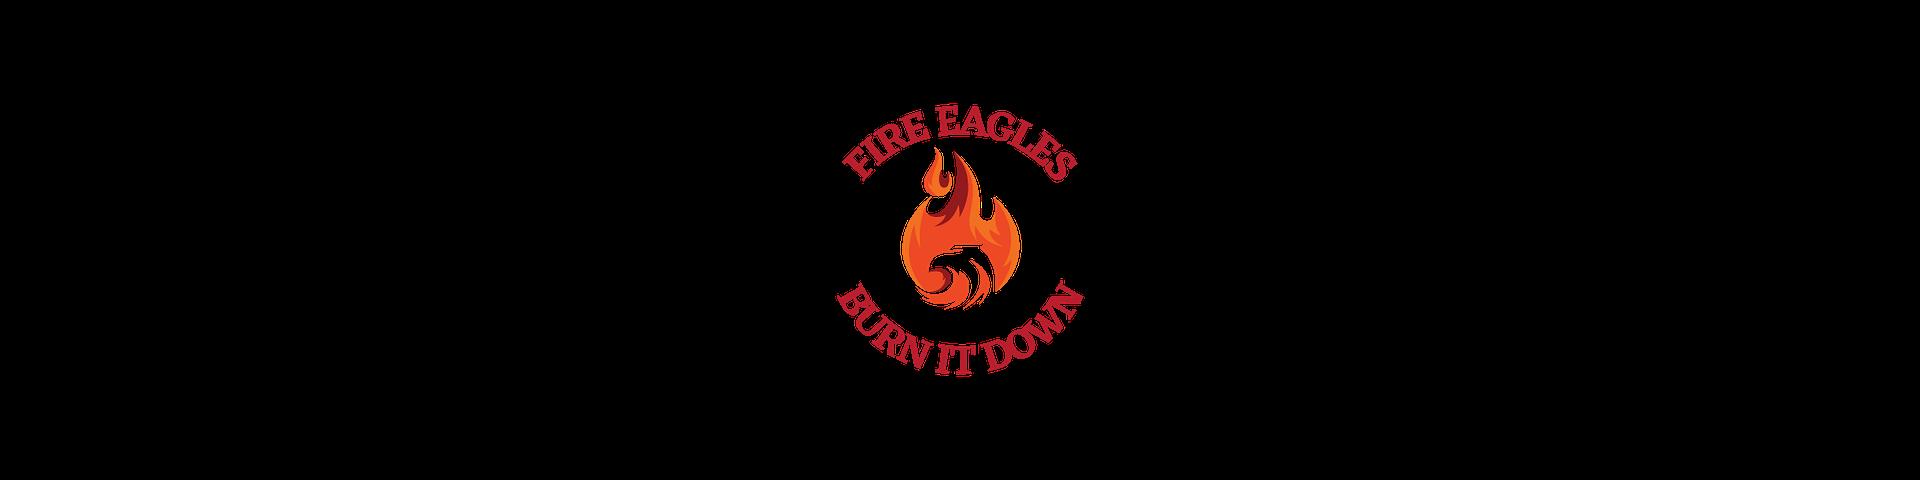 619th Fire Eagles S3